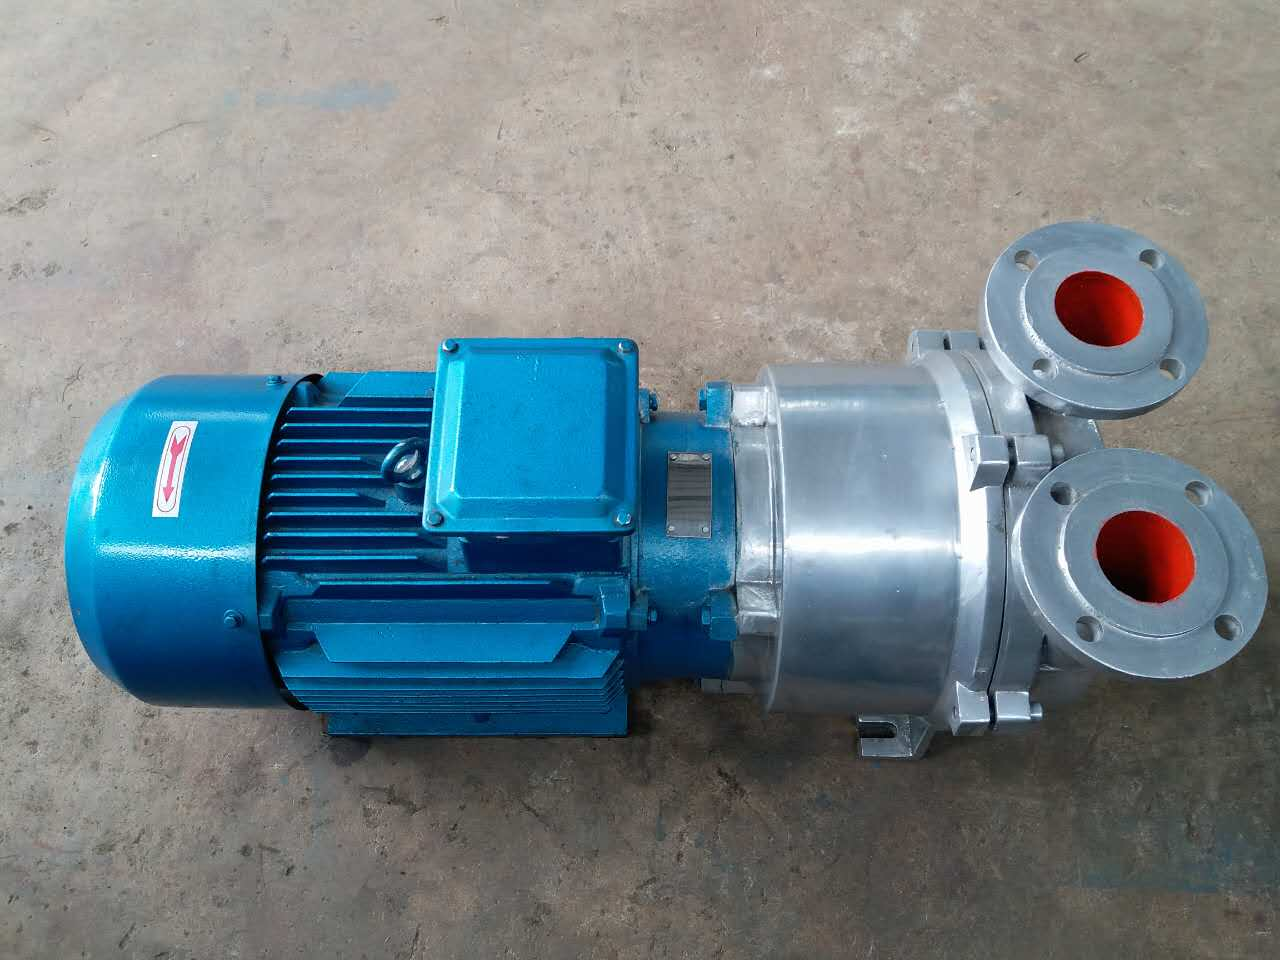 SZ-2-4水环式真空泵|水环式真空泵-上海诚叶真空设备有限责任公司